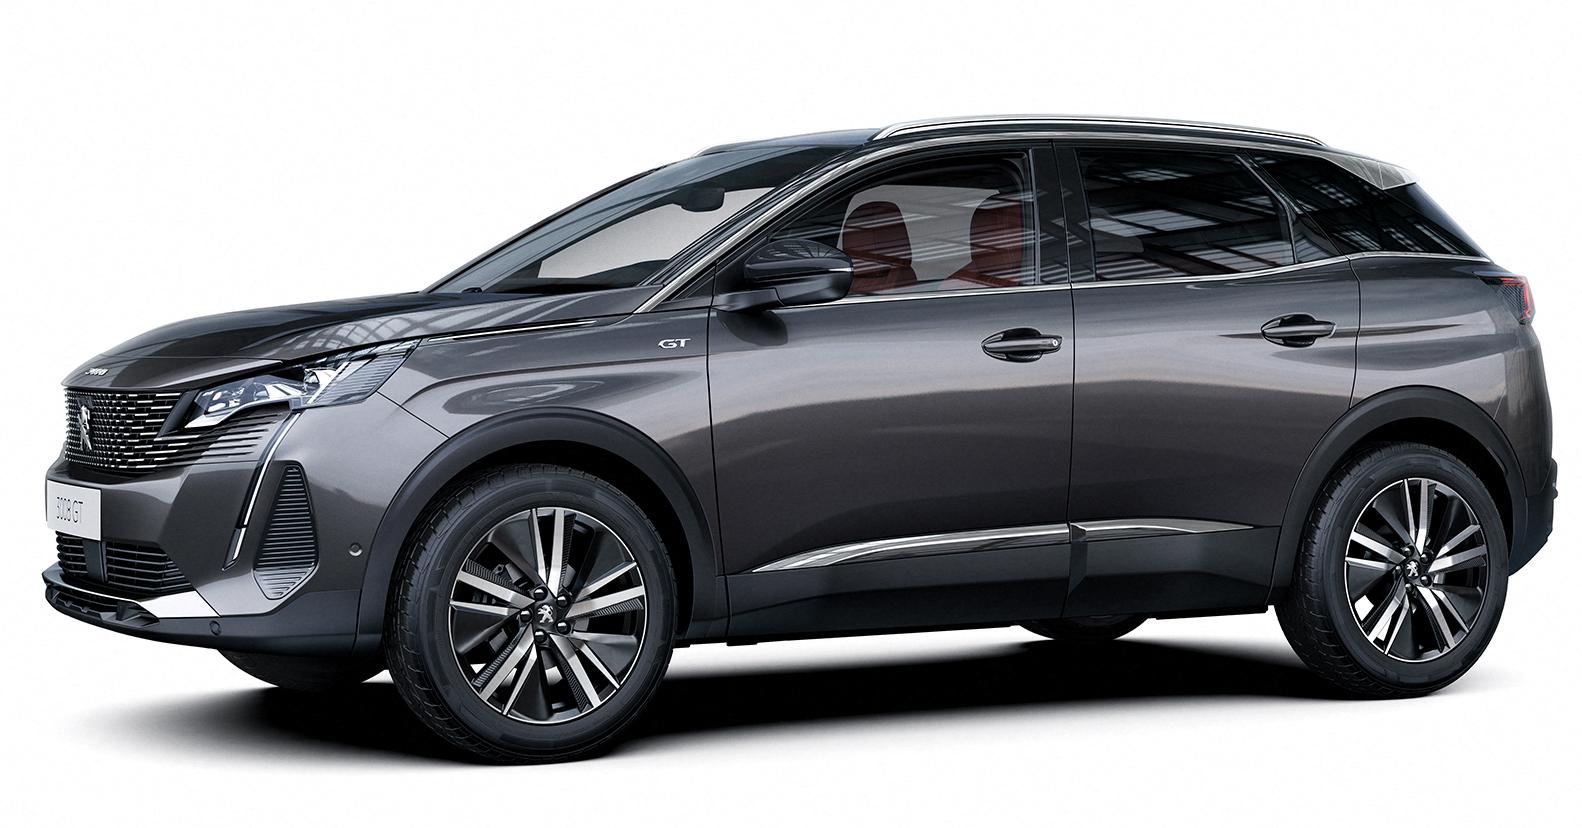 2021-Peugeot-3008-Facelift-Extra-Pics-8.jpg